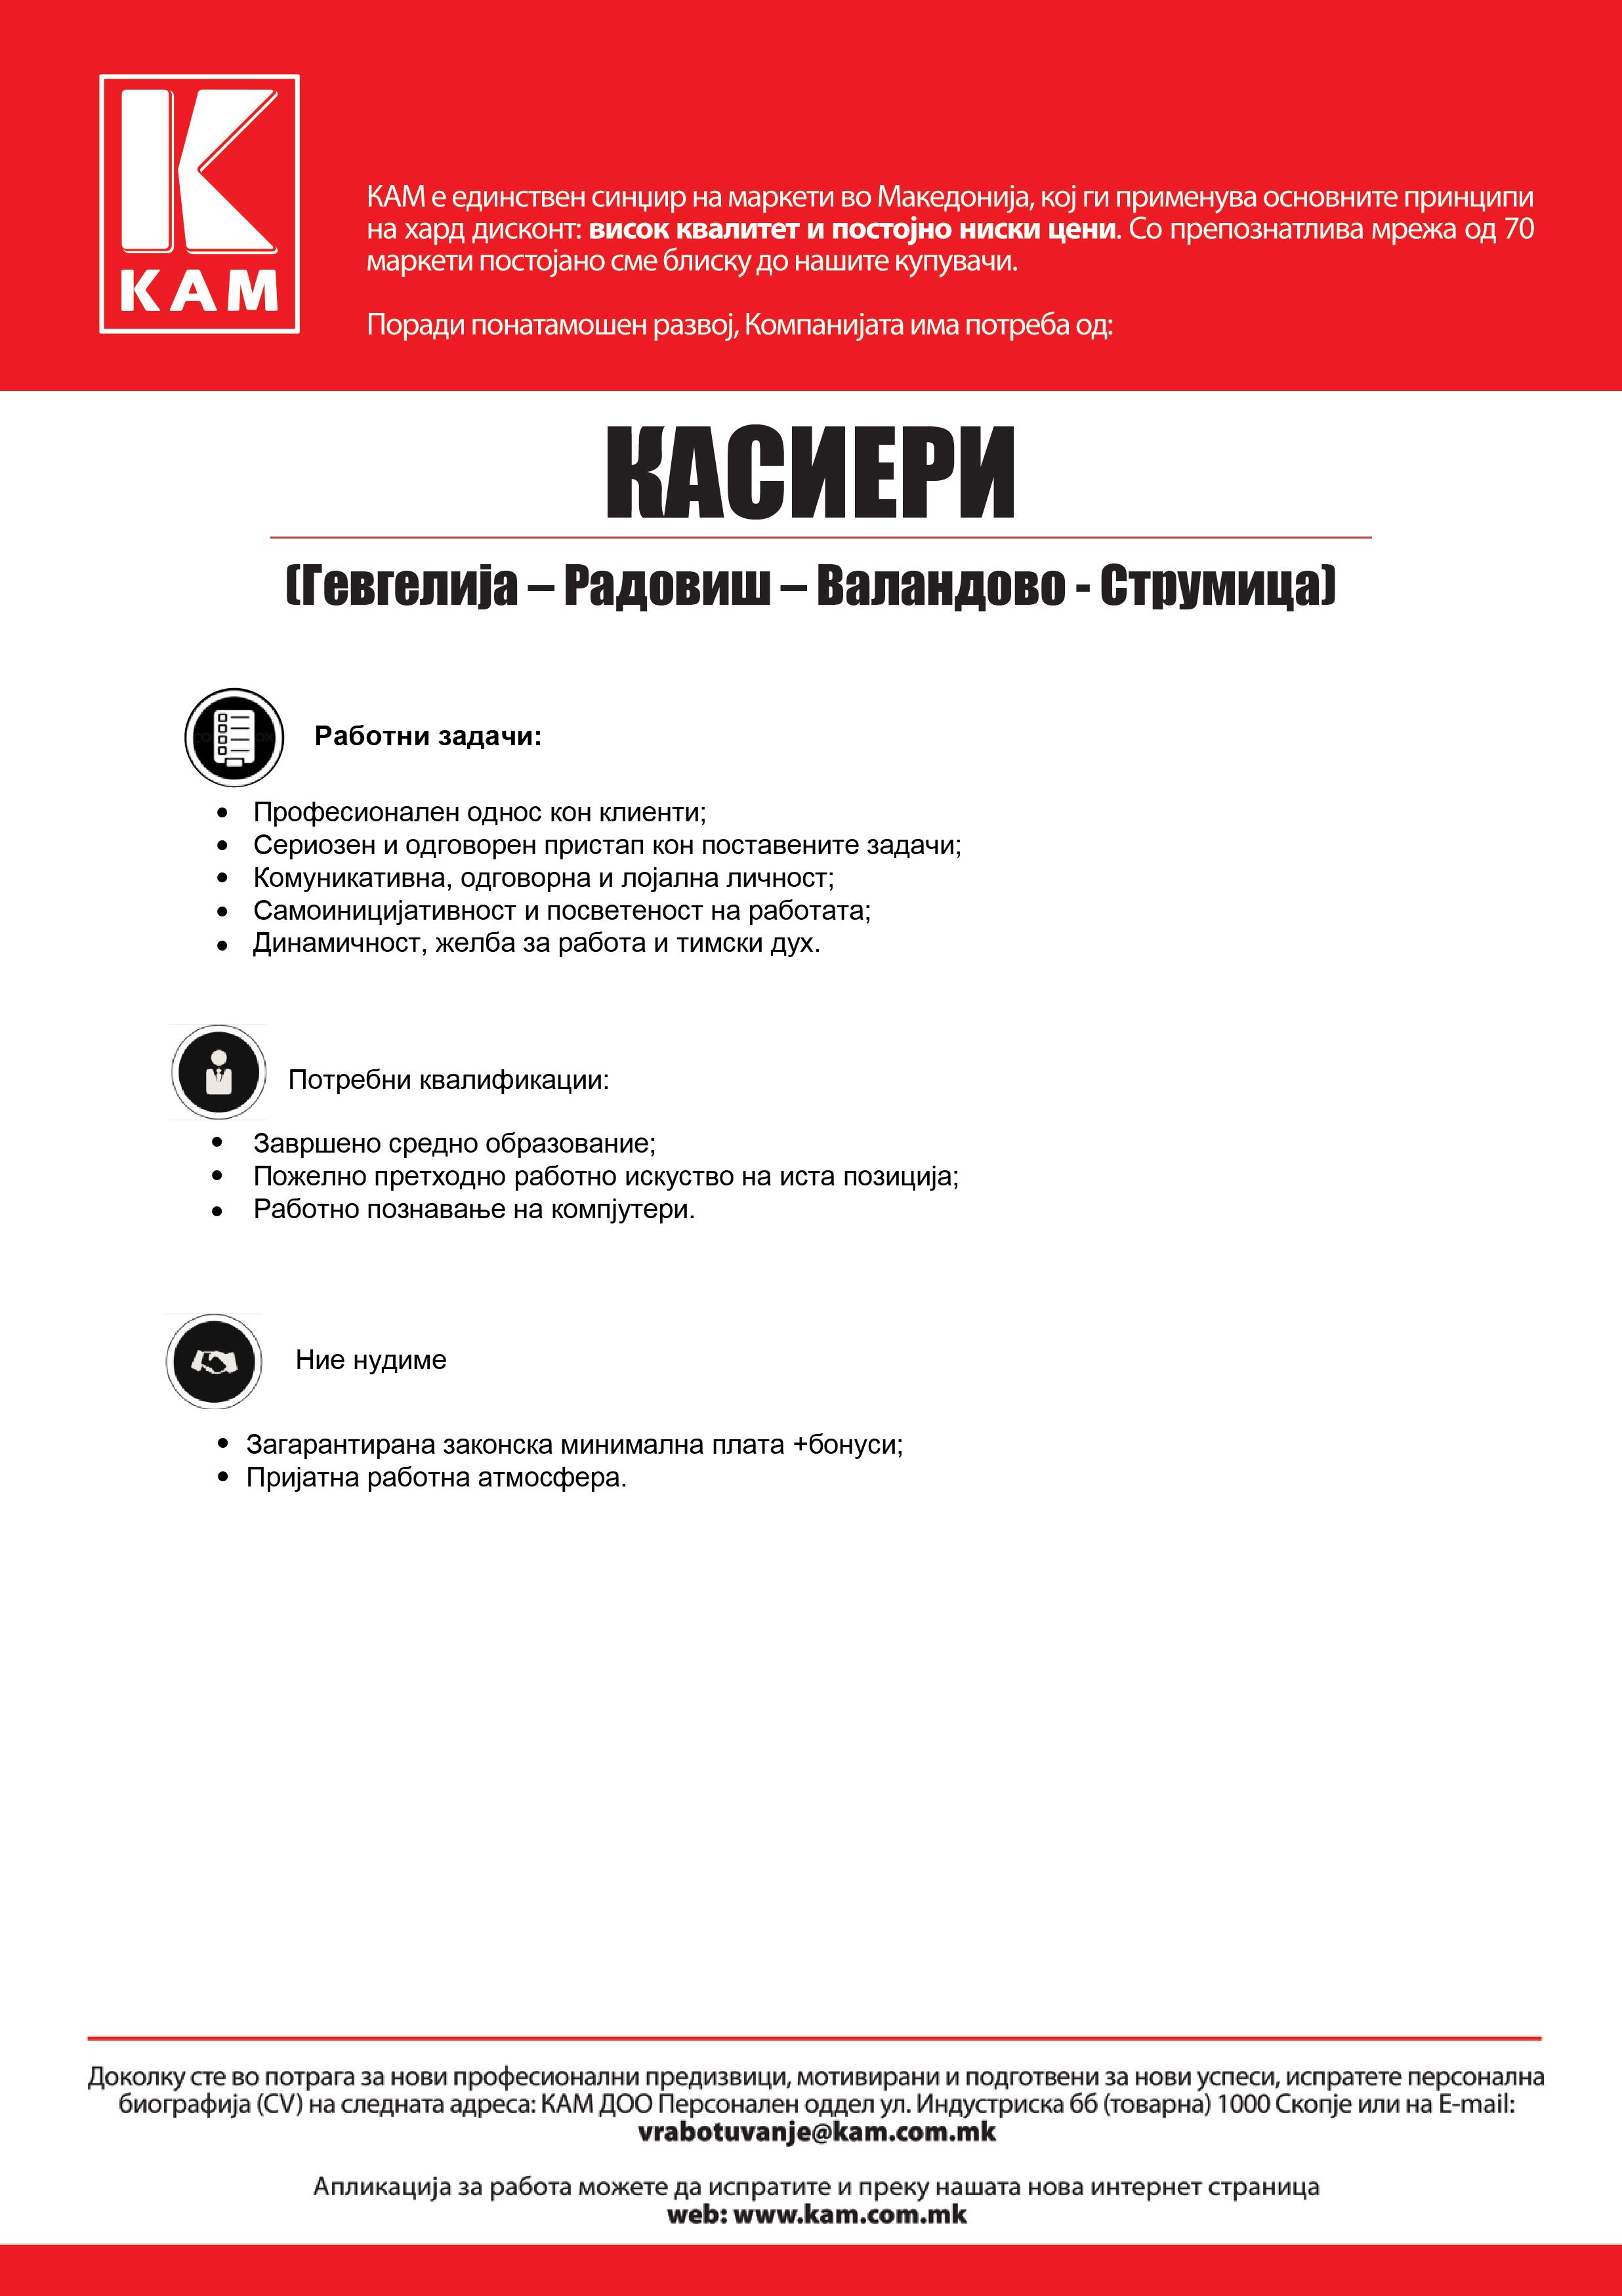 03 KASIERI GEVGELIJA RADOVISH VALANDOVO STRUMICA-01